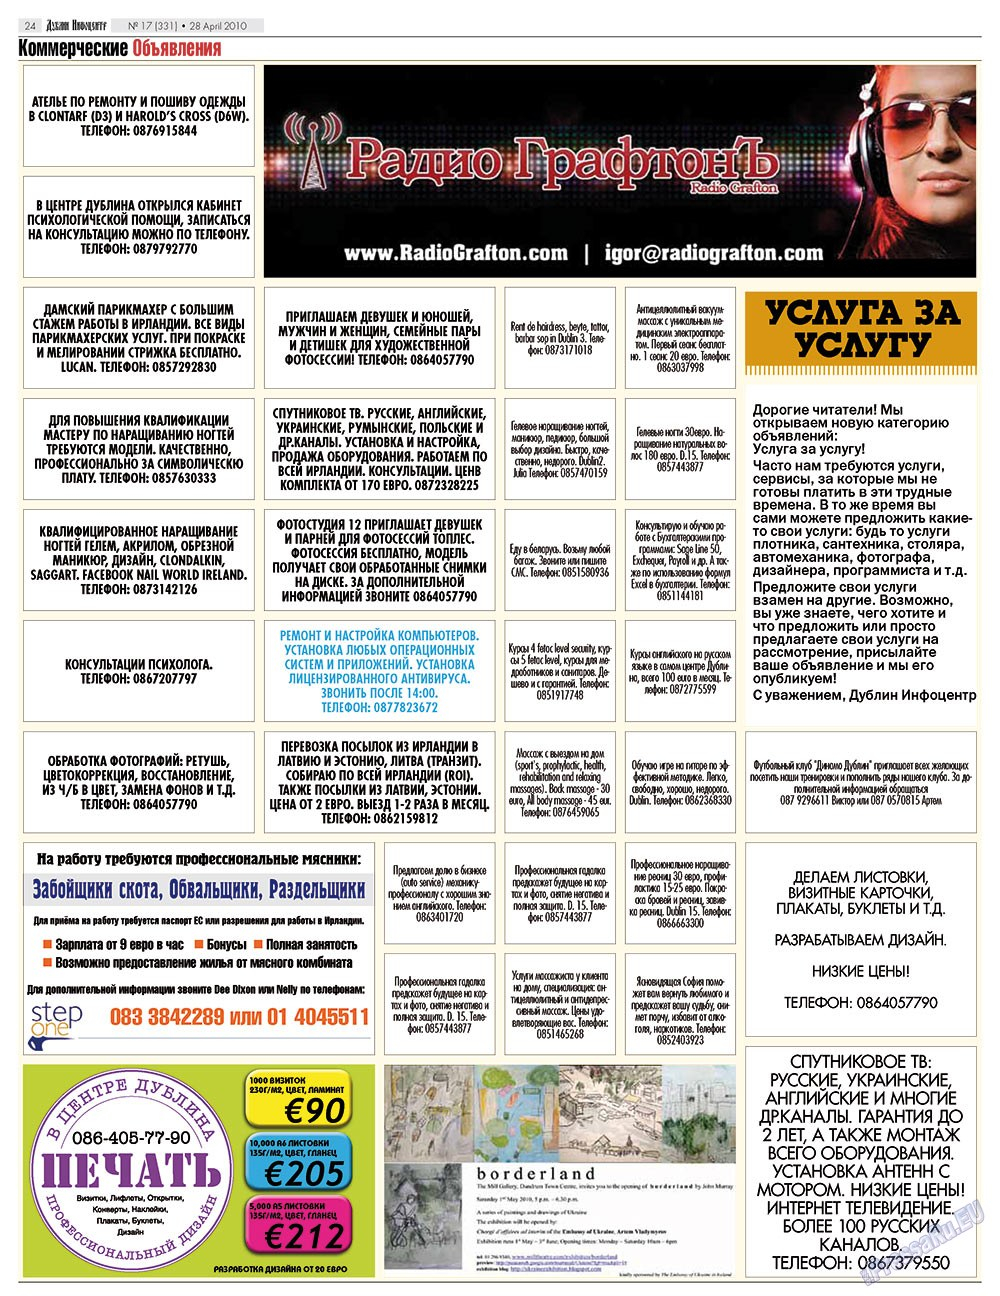 Дублин инфоцентр (газета). 2010 год, номер 17, стр. 24